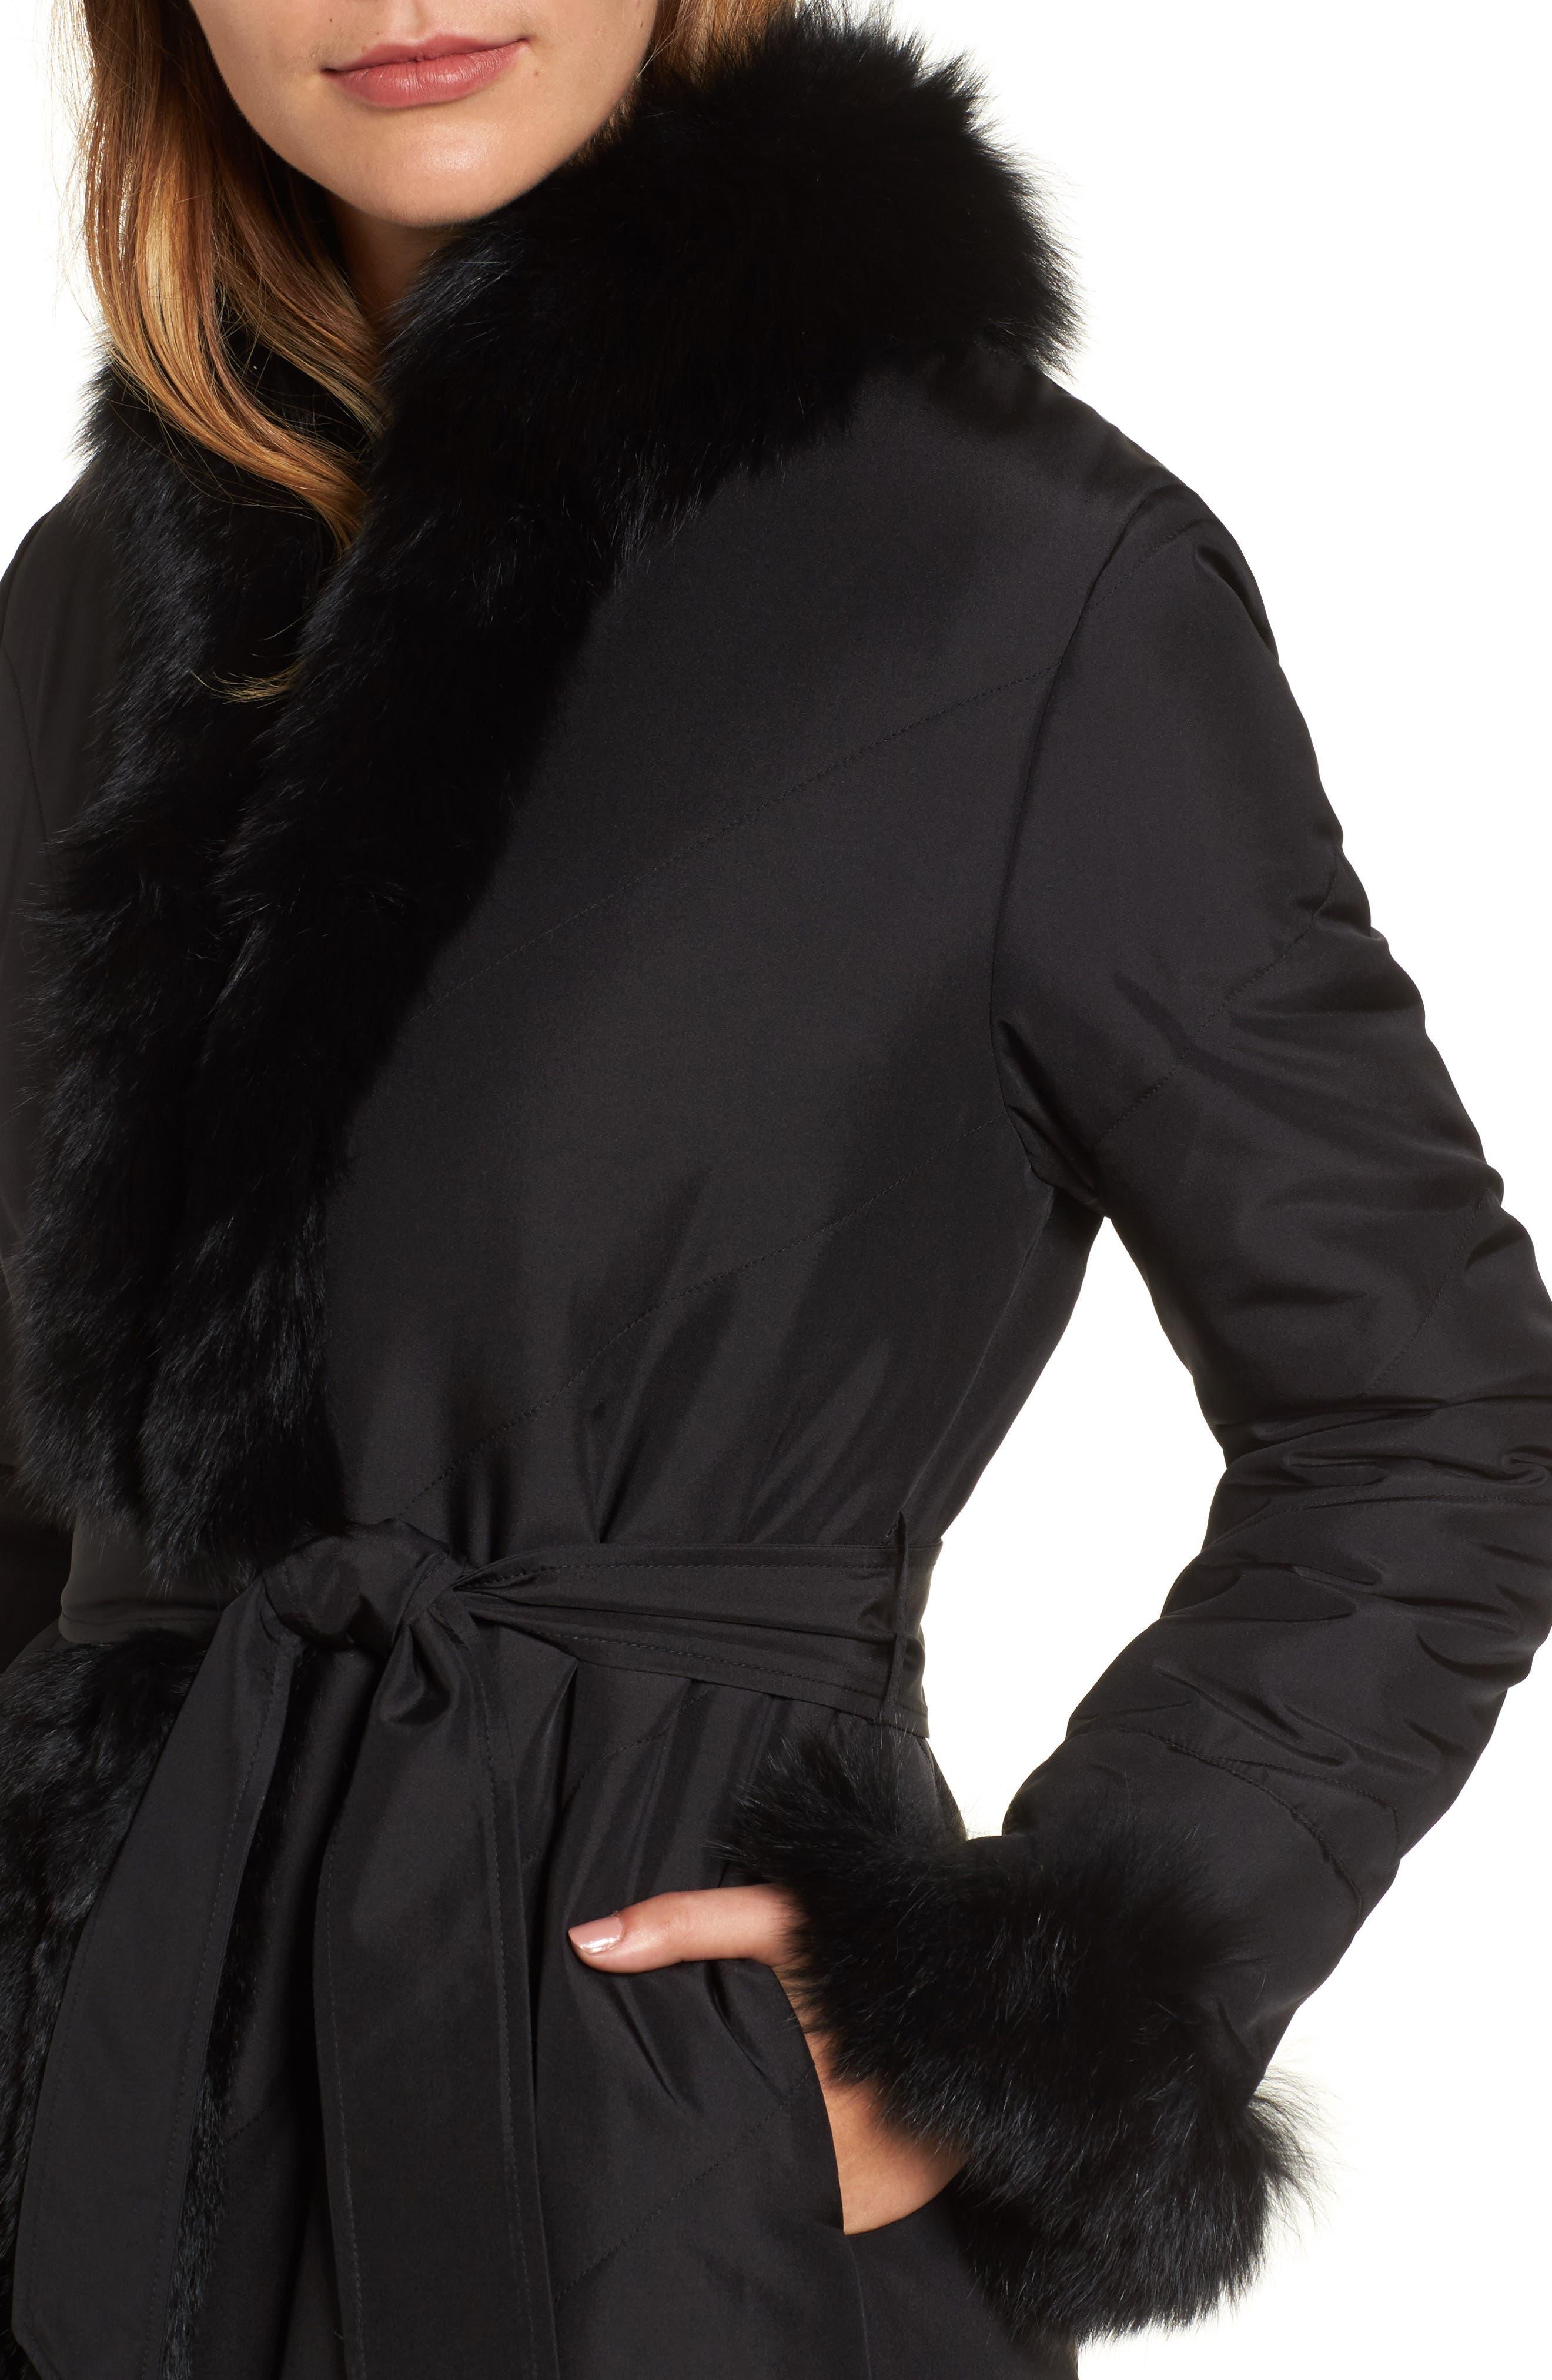 Couture Packable Silk Coat with Genuine Fox Fur & Genuine Rabbit Fur,                             Alternate thumbnail 4, color,                             001